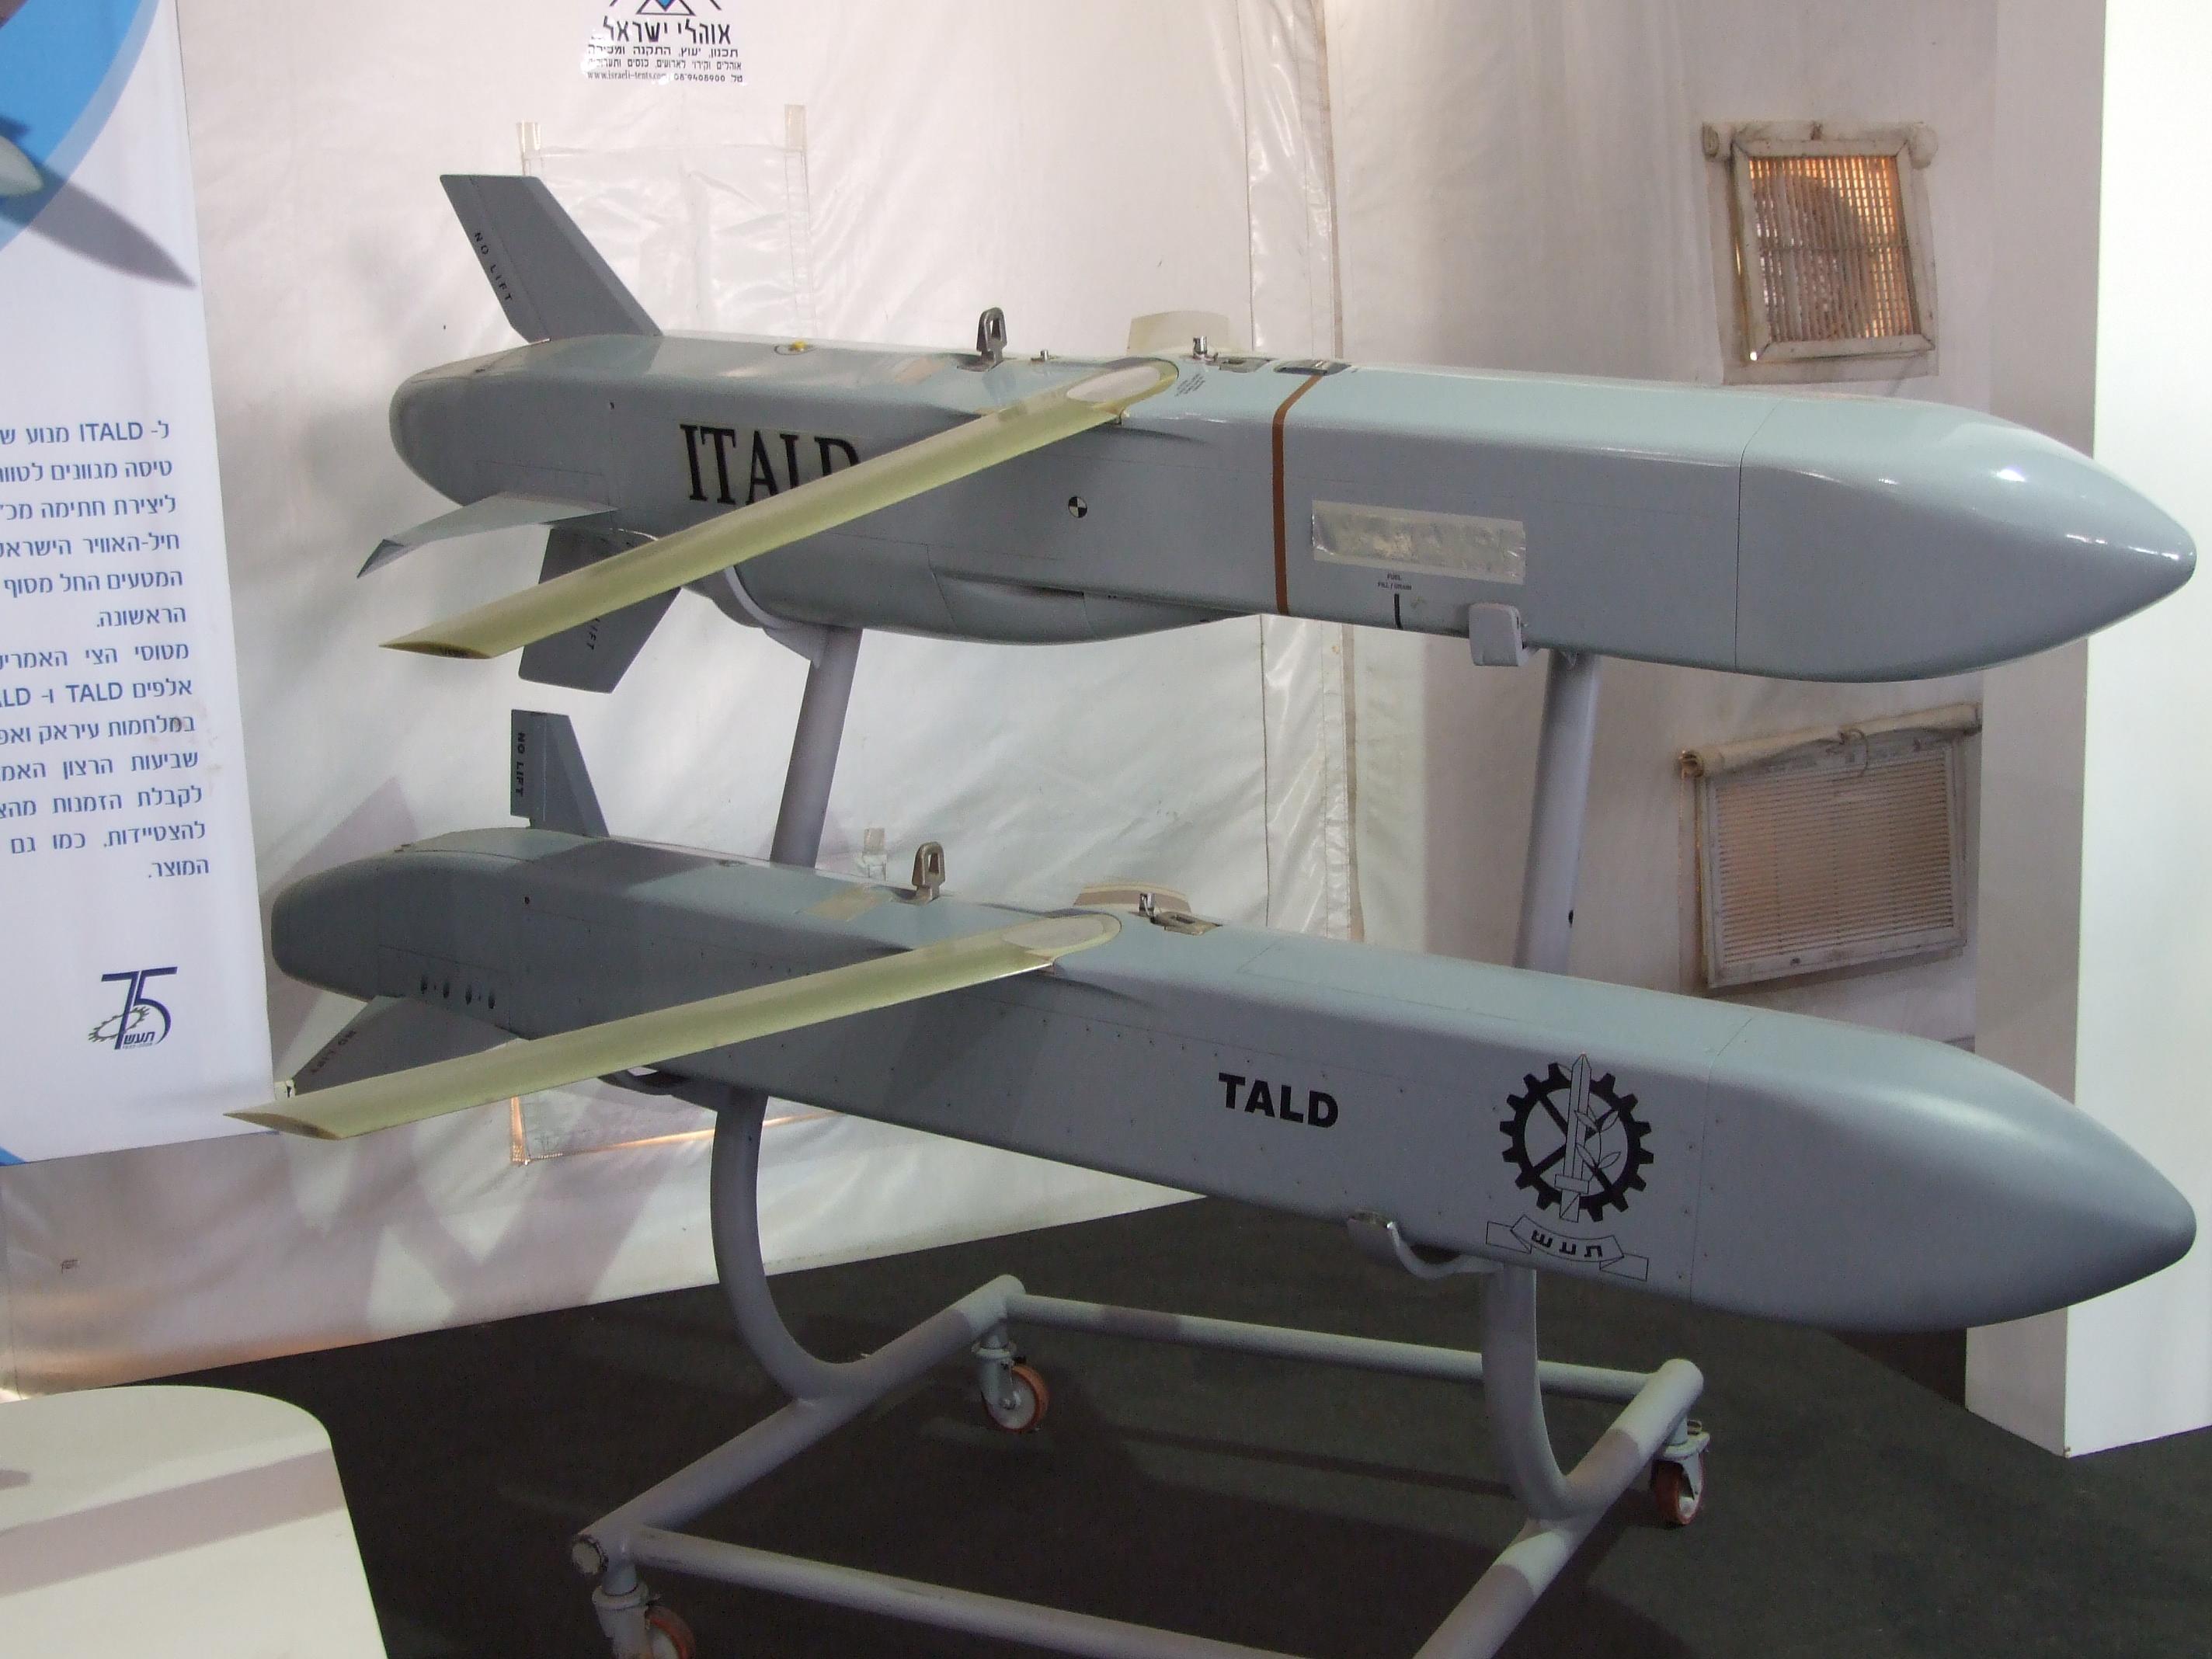 ADM-141_TALD_and_ADM-141C_ITALD_decoy_missiles_on_display.jpg